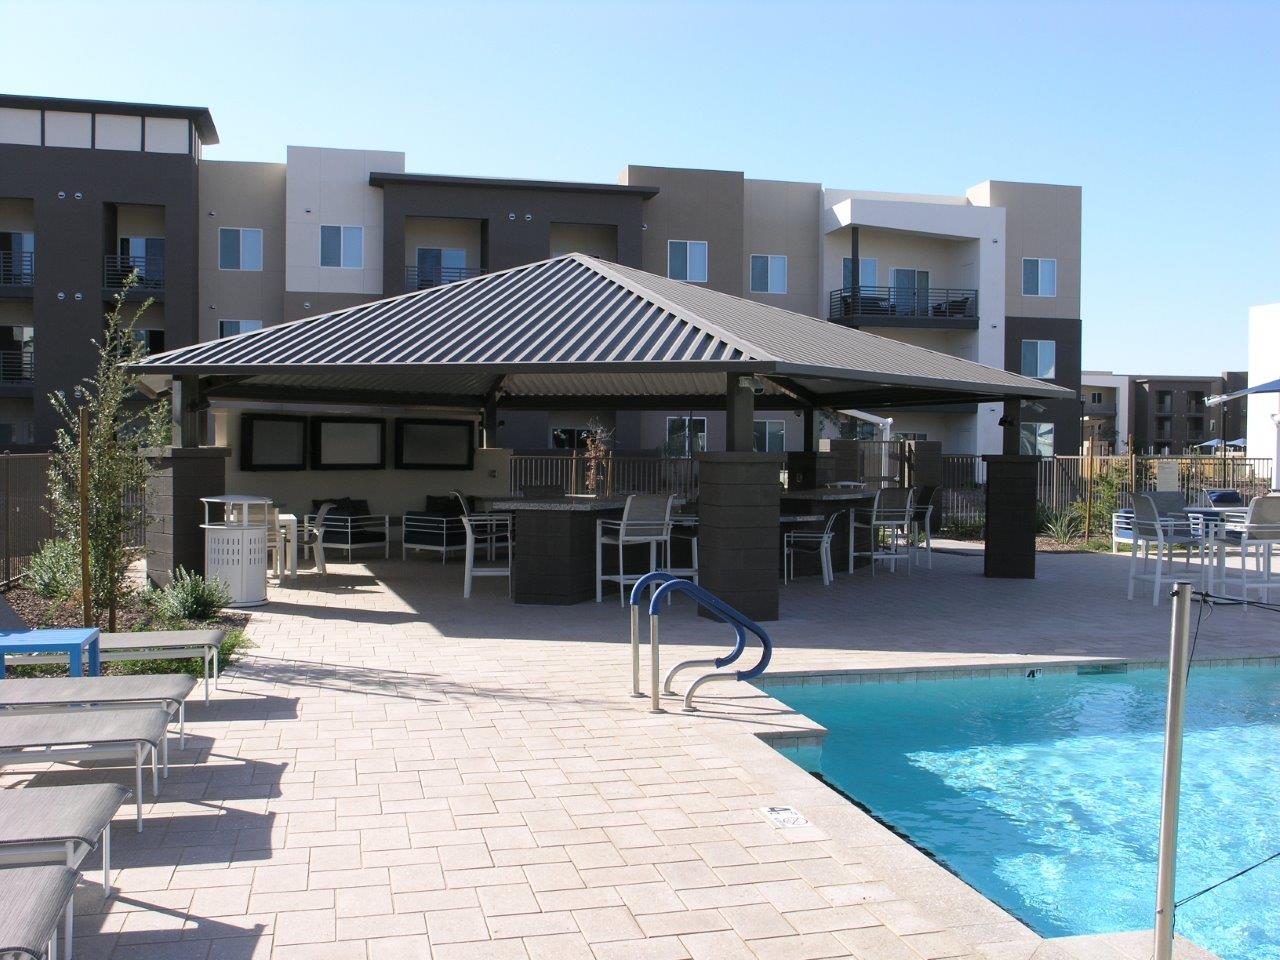 pool shade shelter